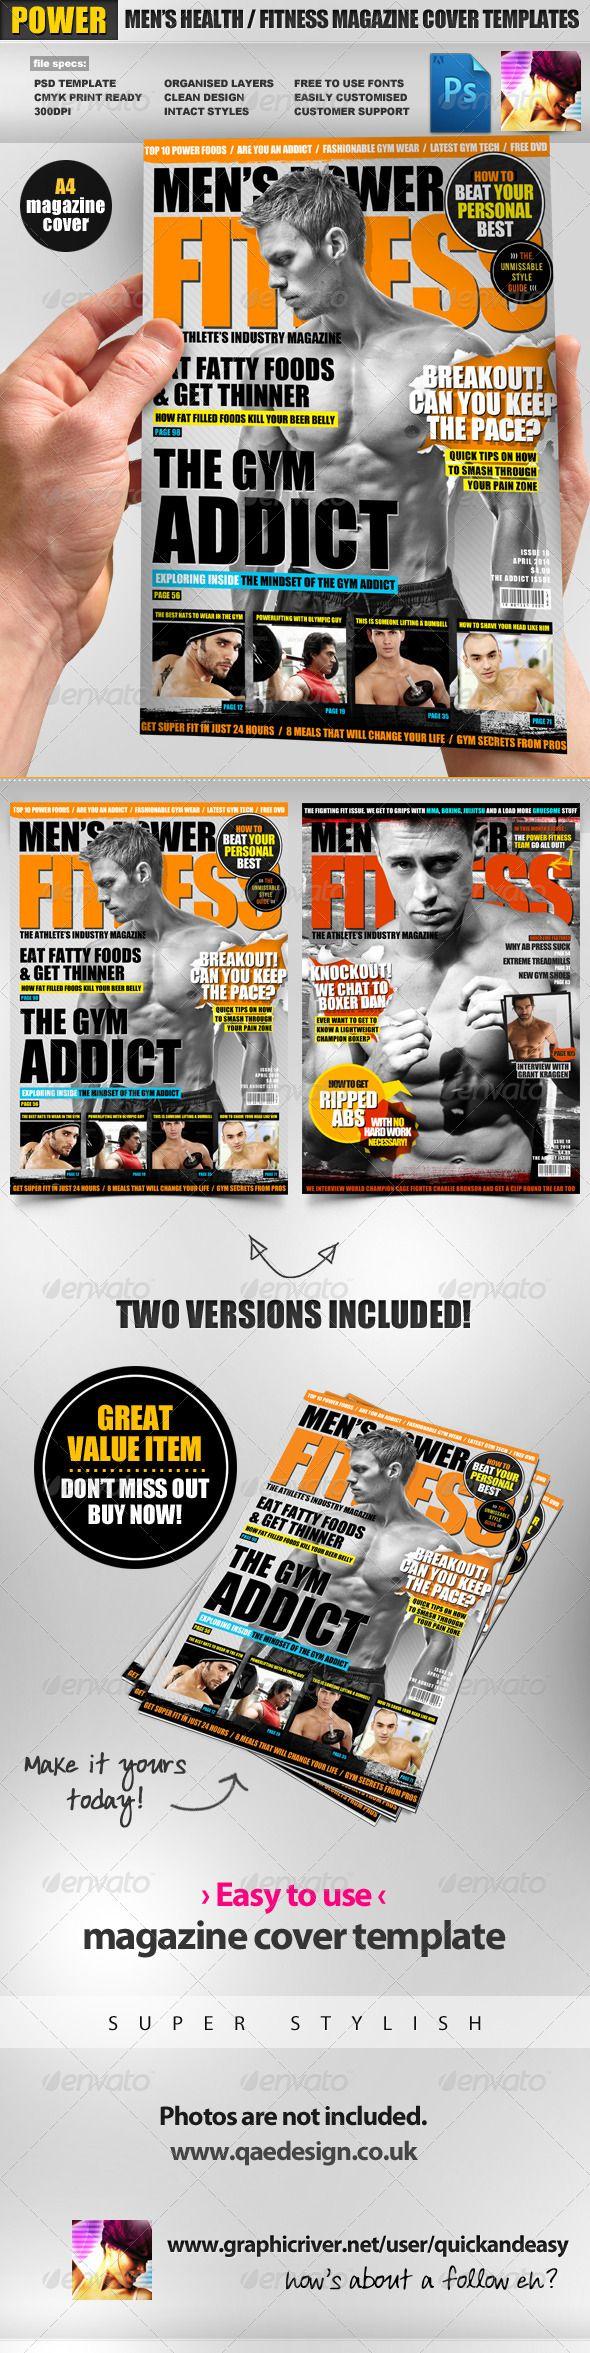 Men\'s Power Fitness Magazine Cover Template | Magazine cover ...